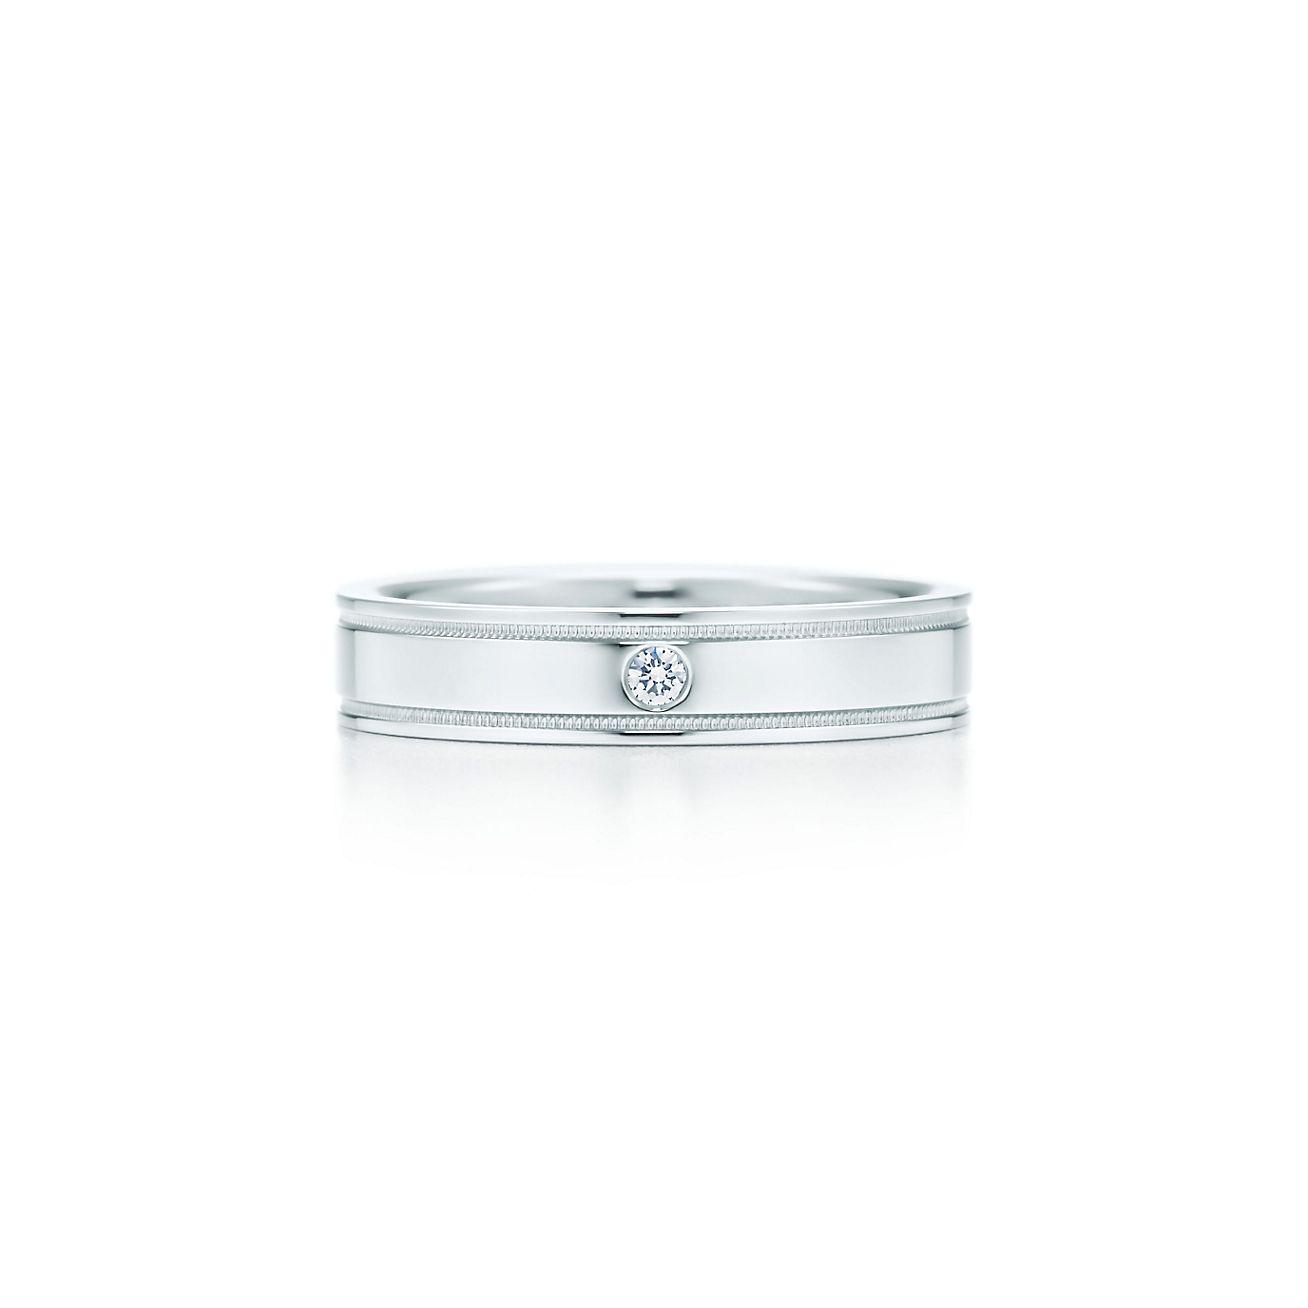 Tiffany flat double milgrain wedding band ring in platinum with a tiffany flat doublebrmilgrain weddingbrband ring junglespirit Image collections